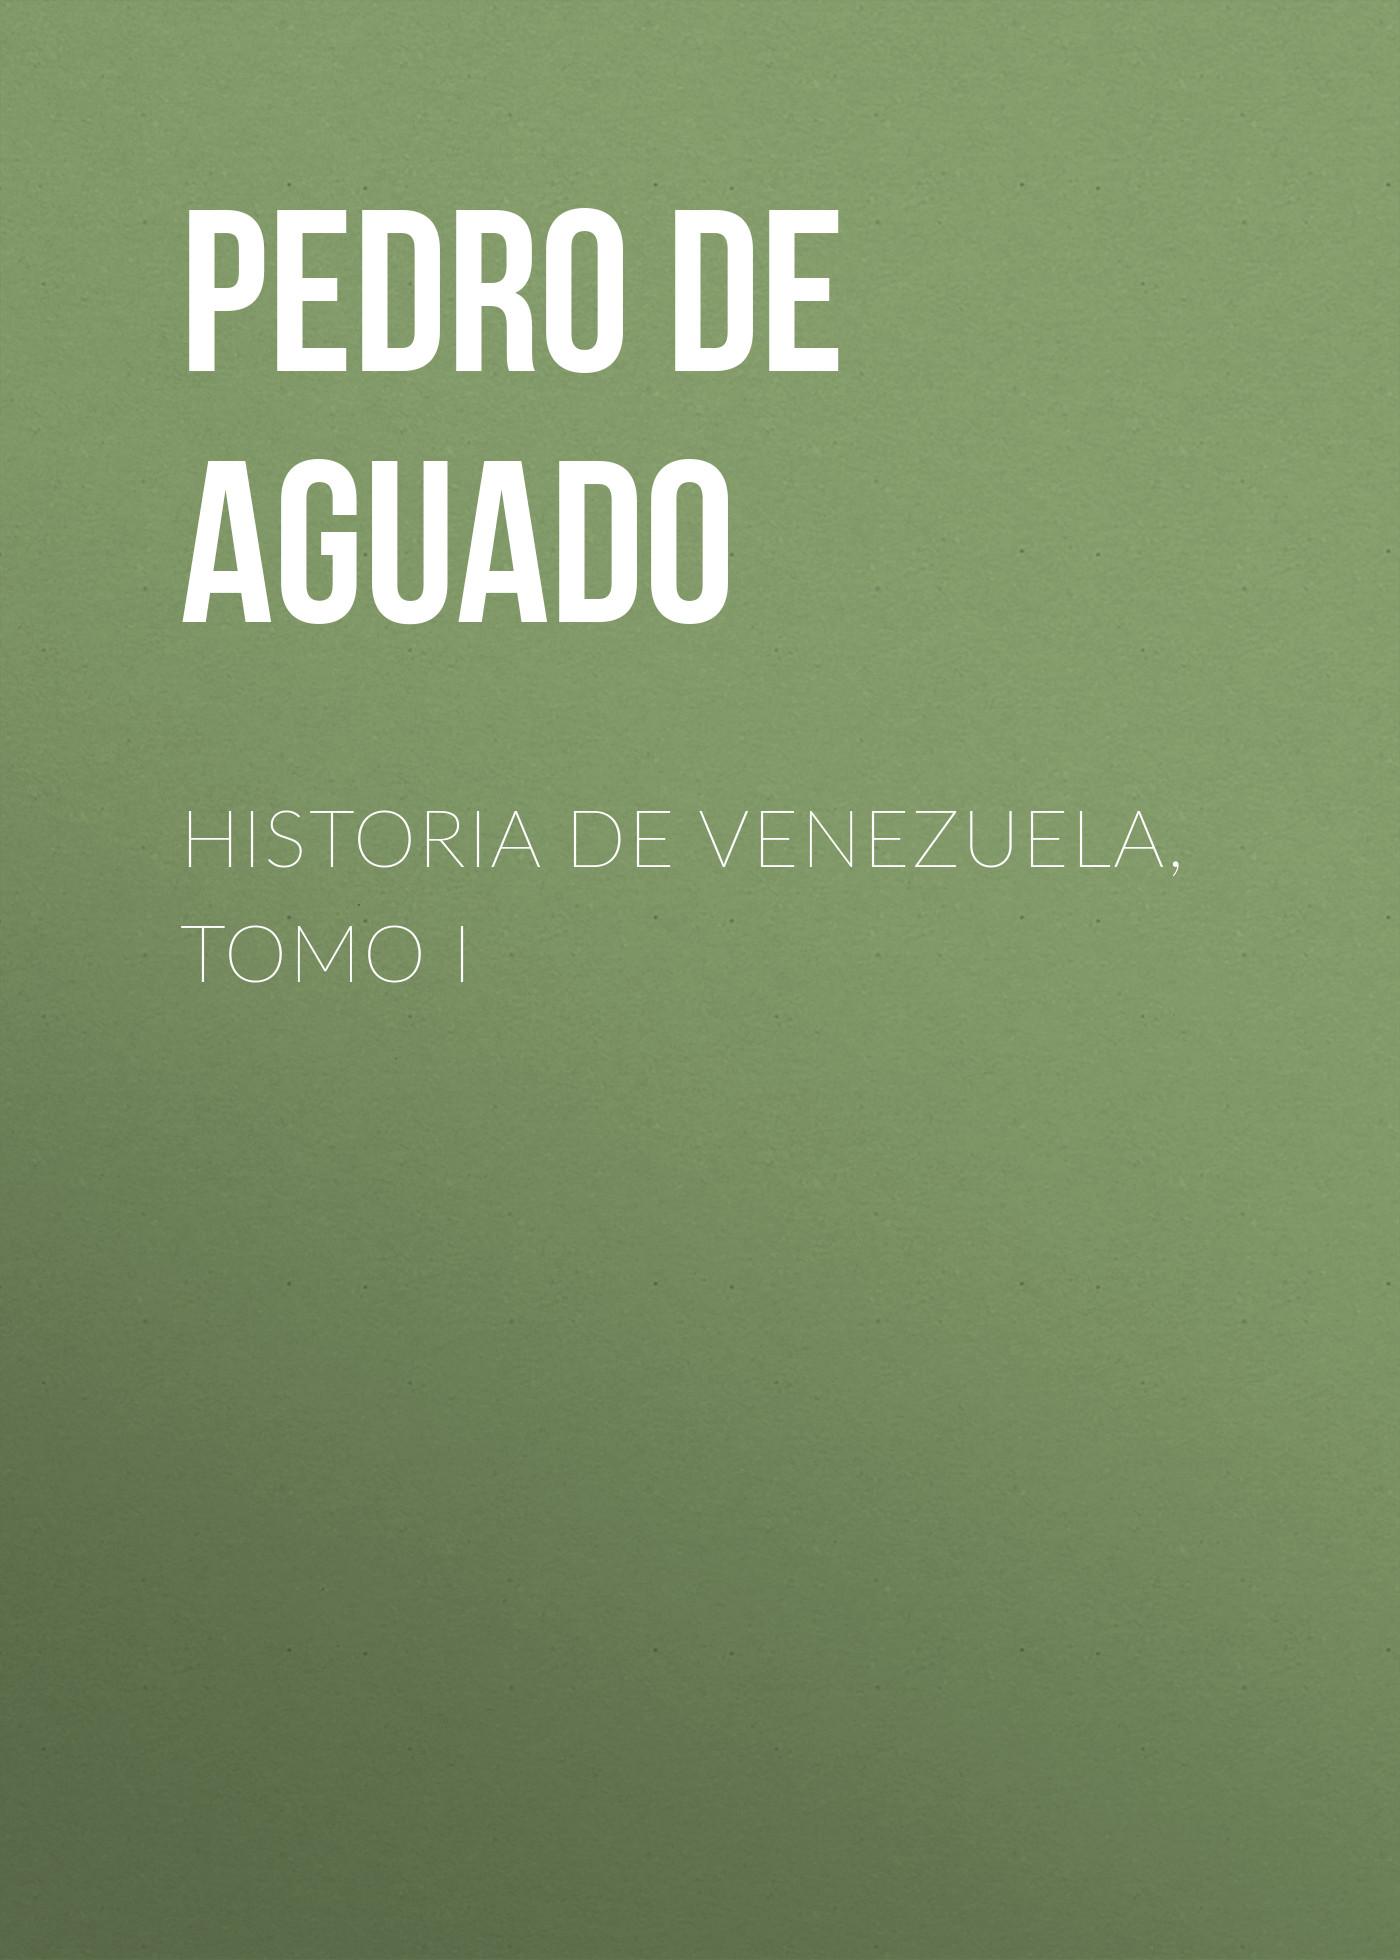 Pedro de Aguado Historia de Venezuela, Tomo I pedro de aguado historia de venezuela tomo ii